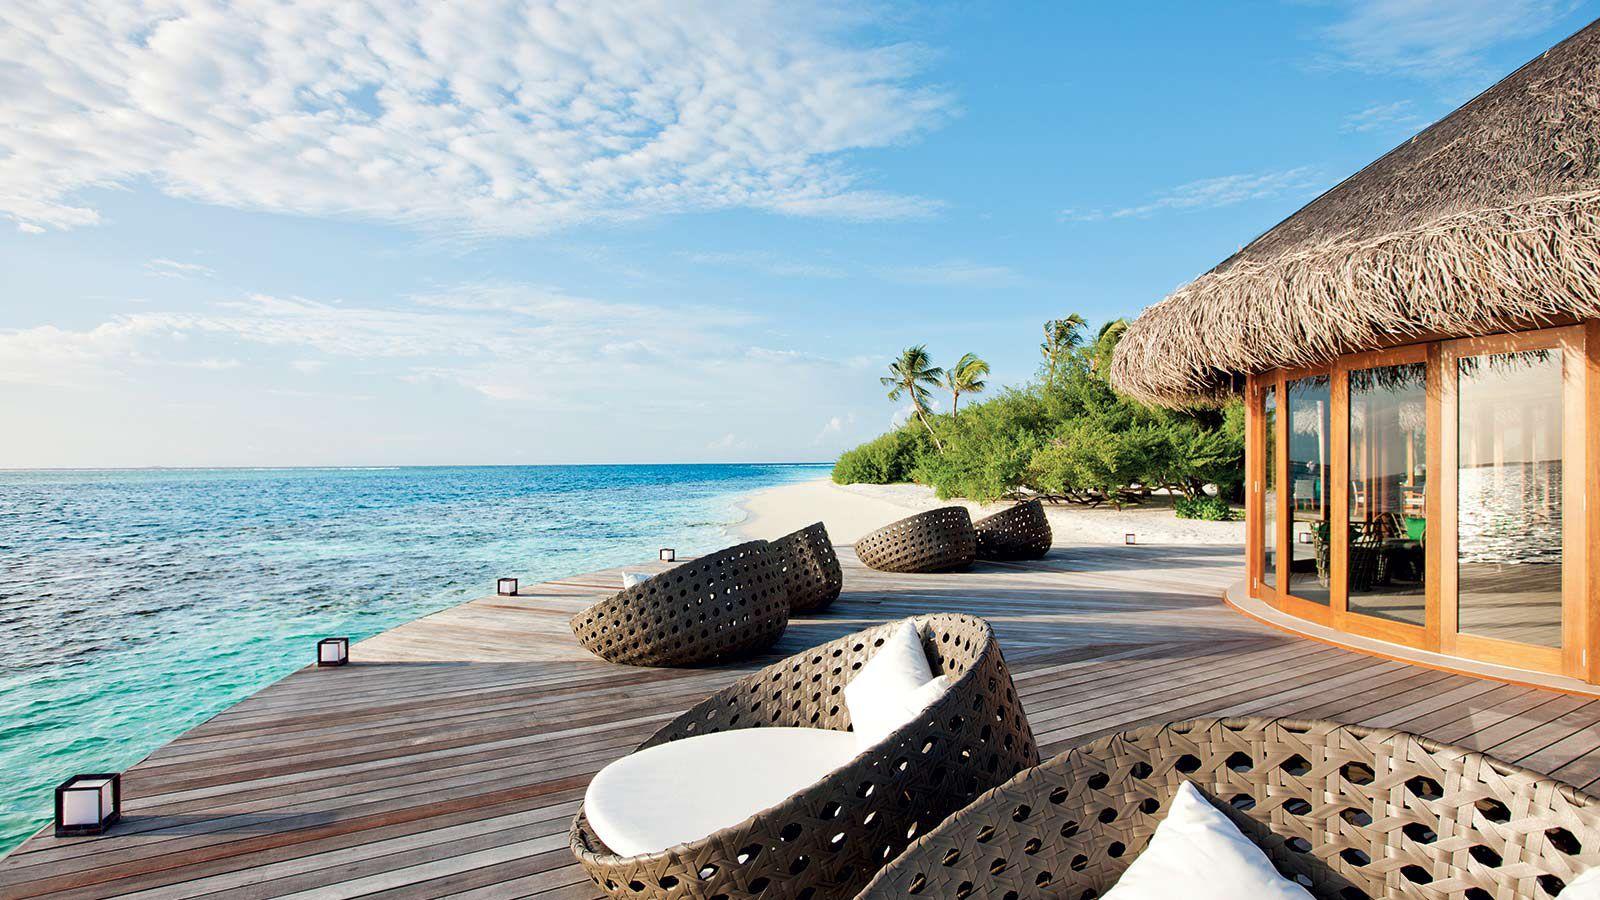 Maldives Hotels - Best Hotels in Maldives - Hideaway Beach Resort